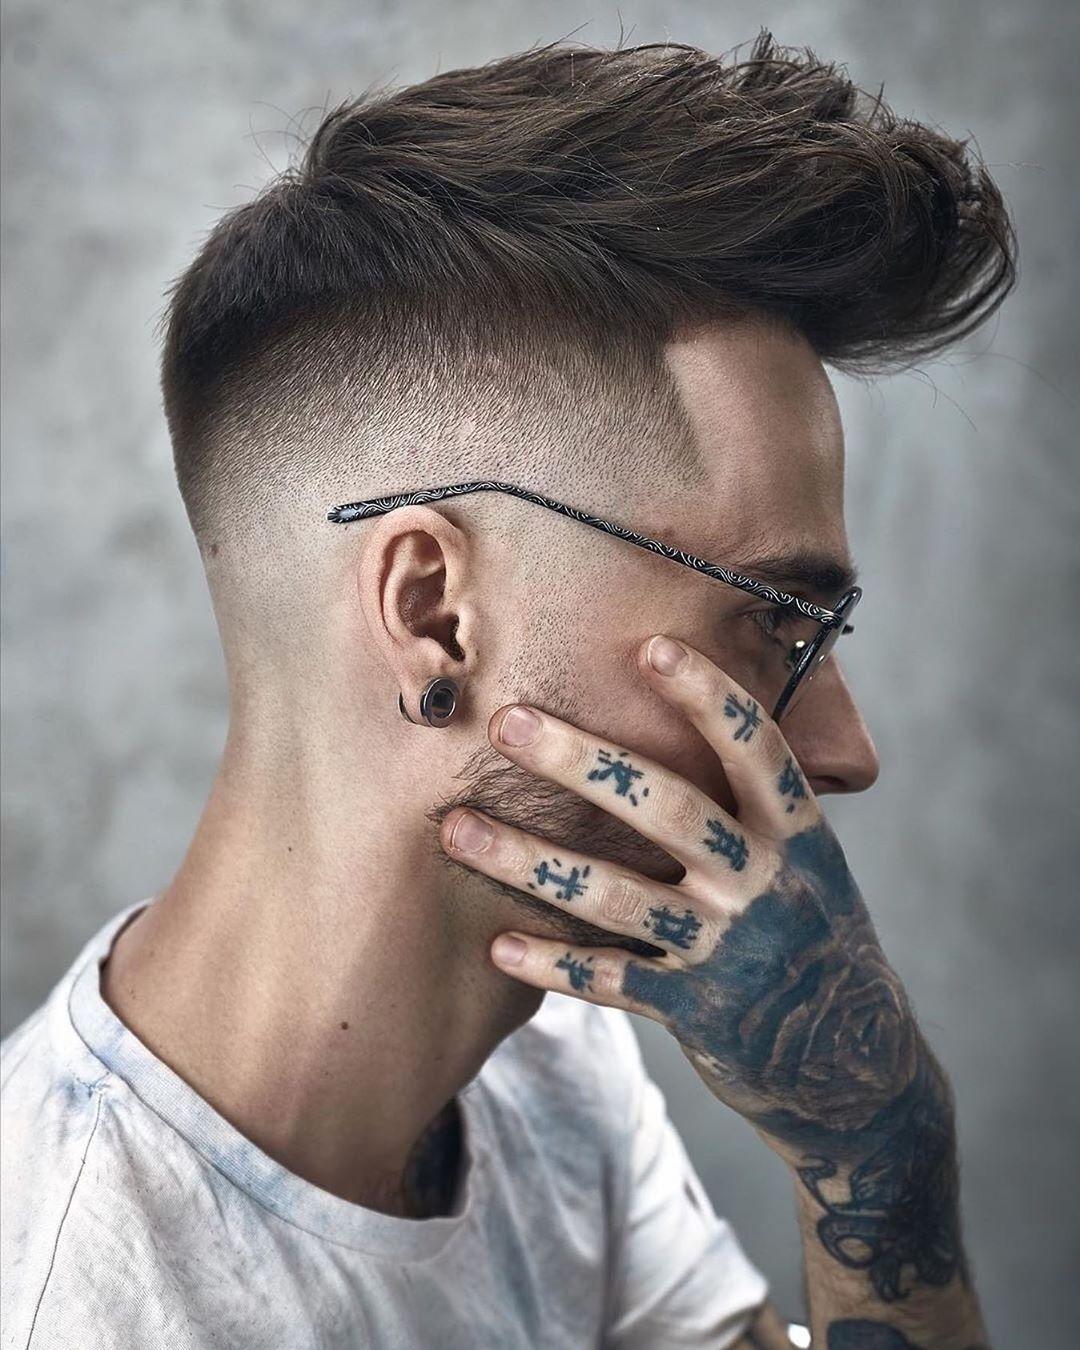 Pin Van Ashley Malone Op Short Hairstyles In 2020 Herenkapsel Undercut